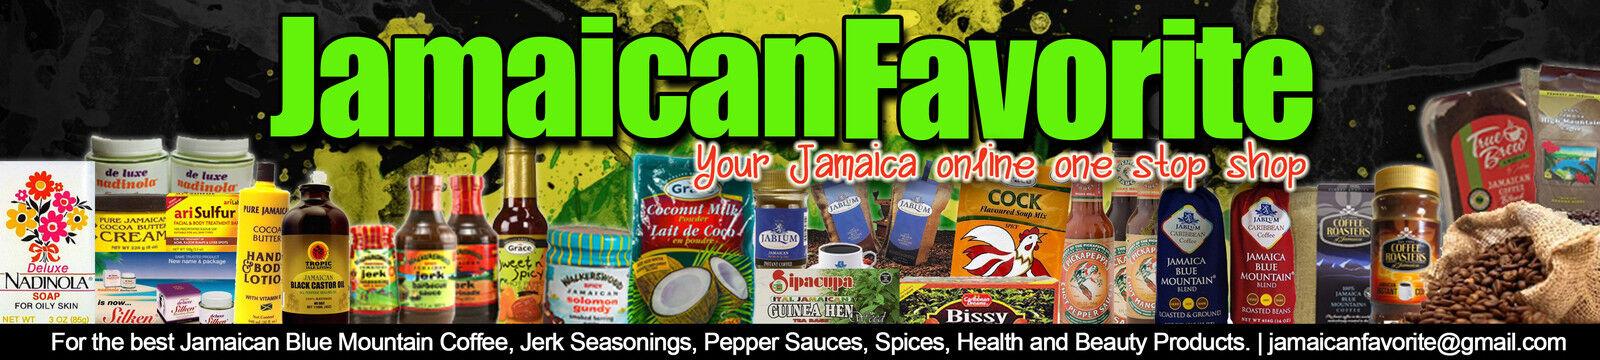 #Jamaicanfavorite